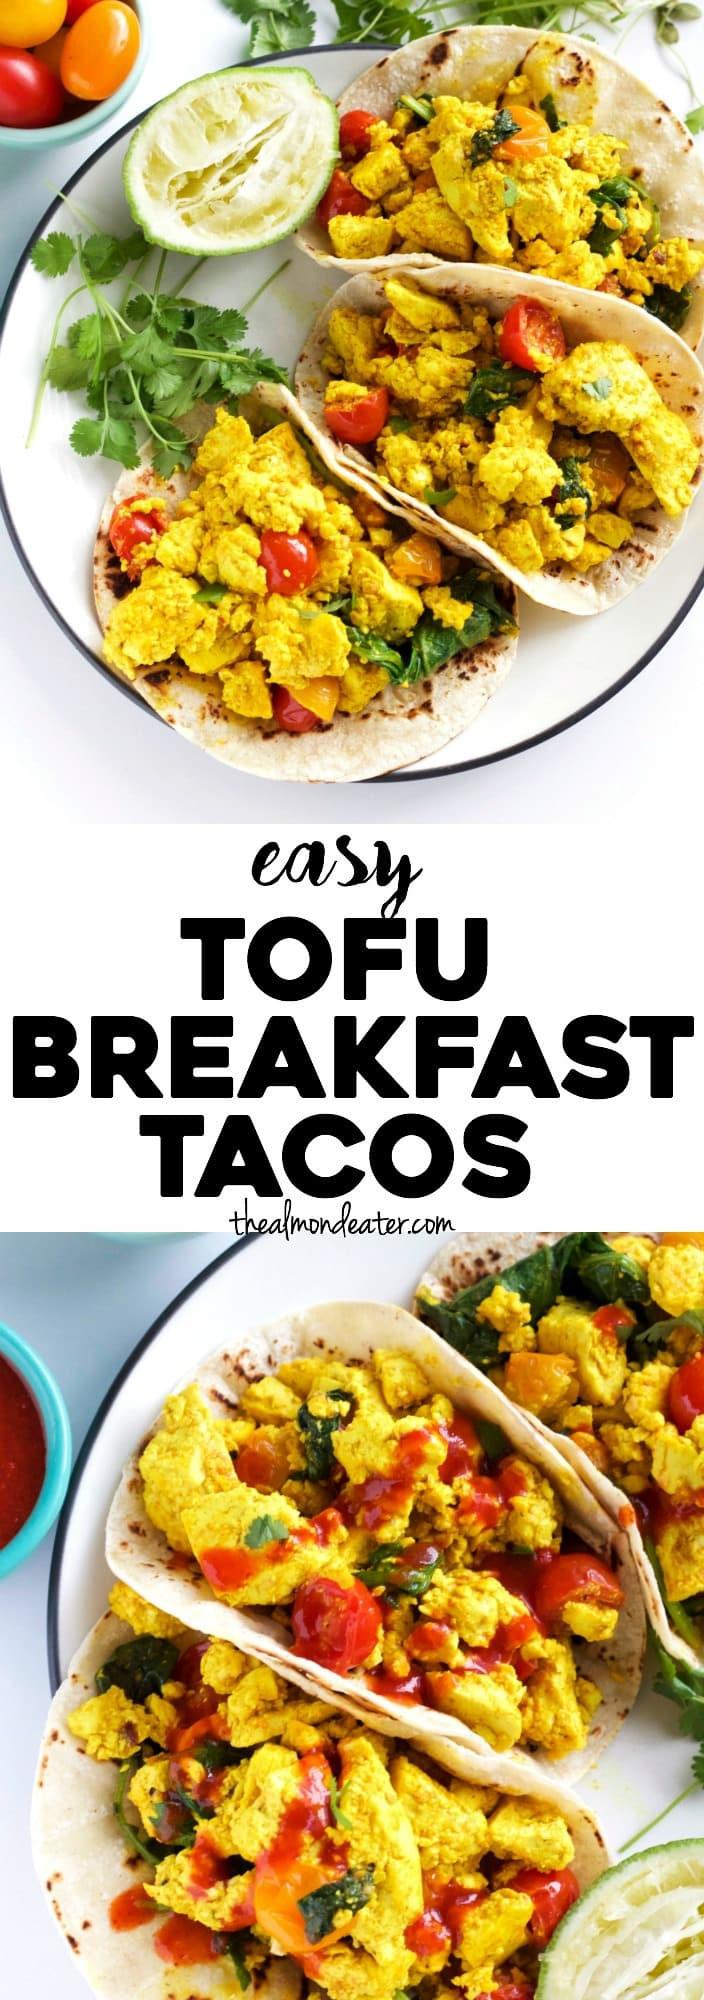 Tofu Breakfast Recipes  Easy Tofu Breakfast Tacos